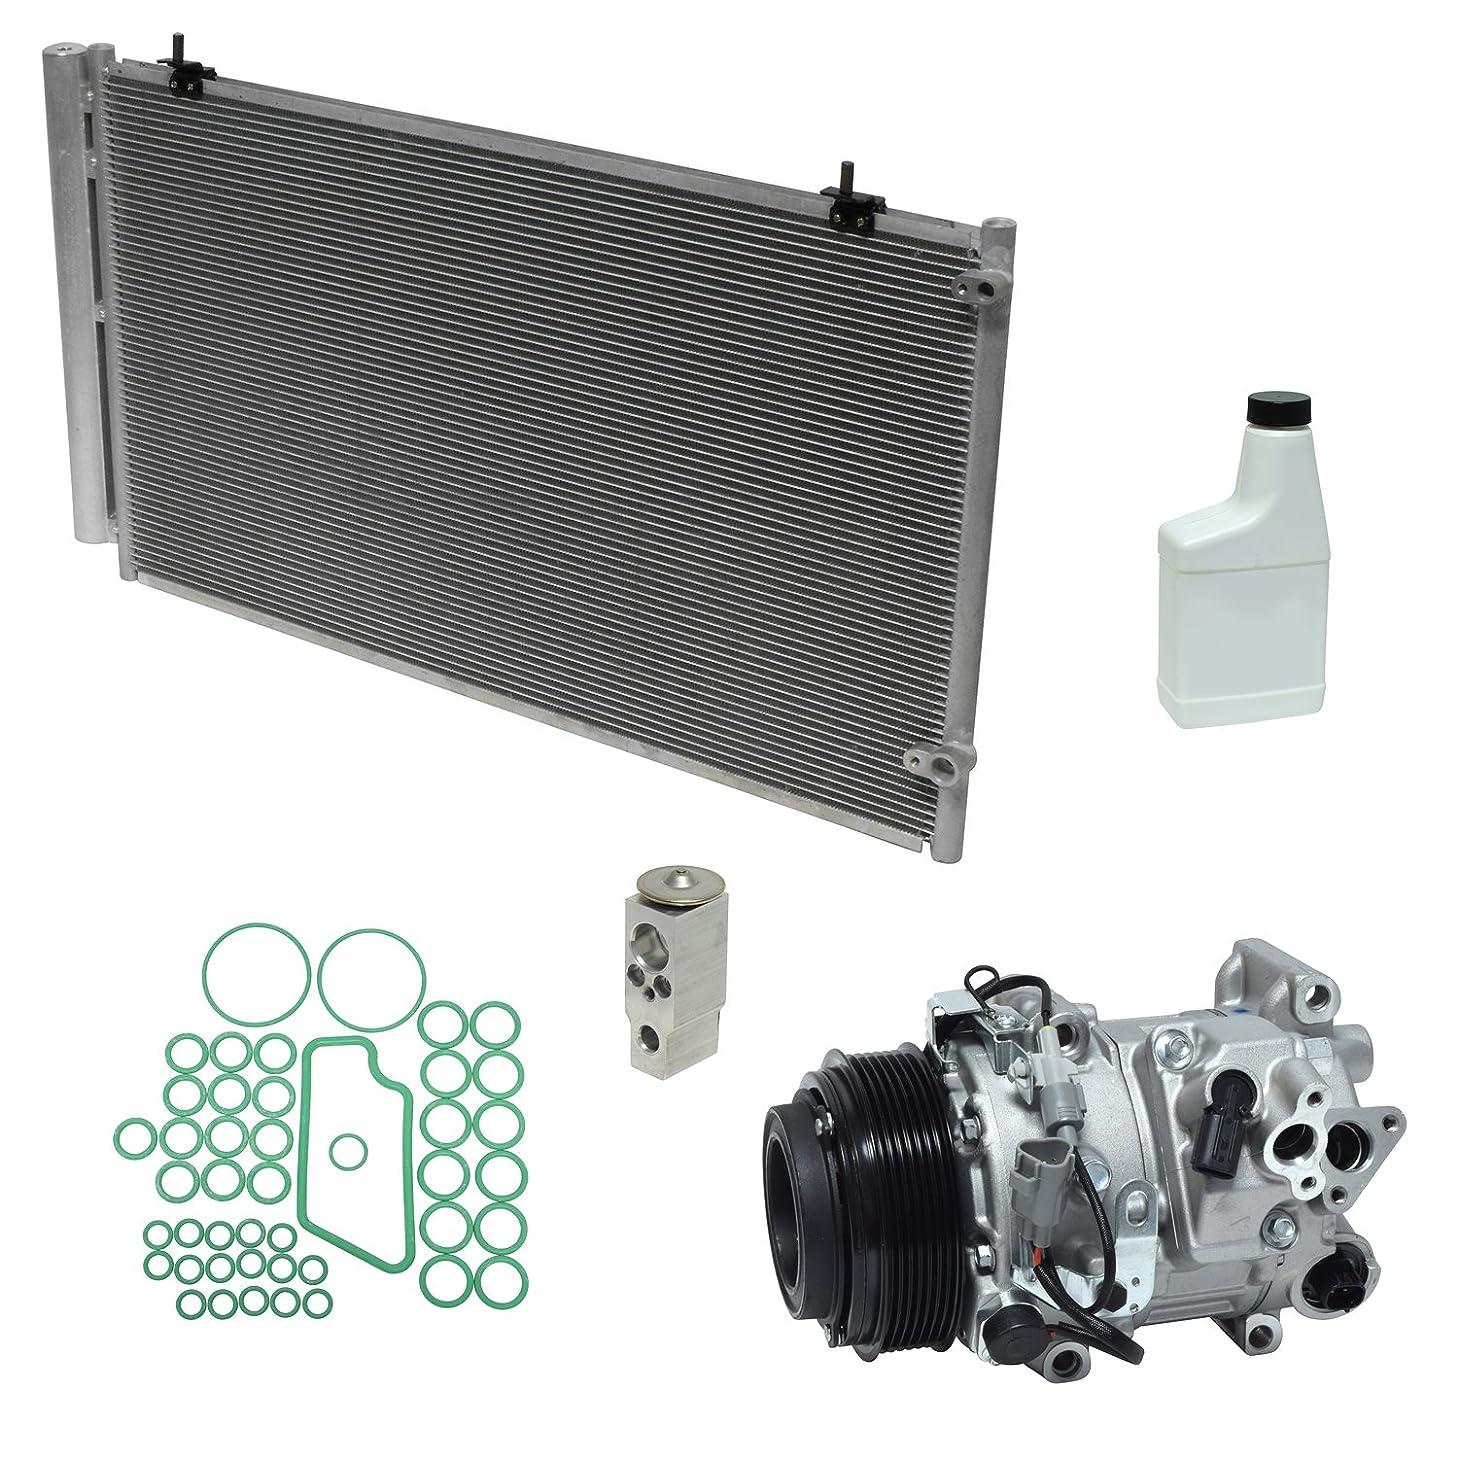 UAC KT 5230A A/C Compressor and Component Kit